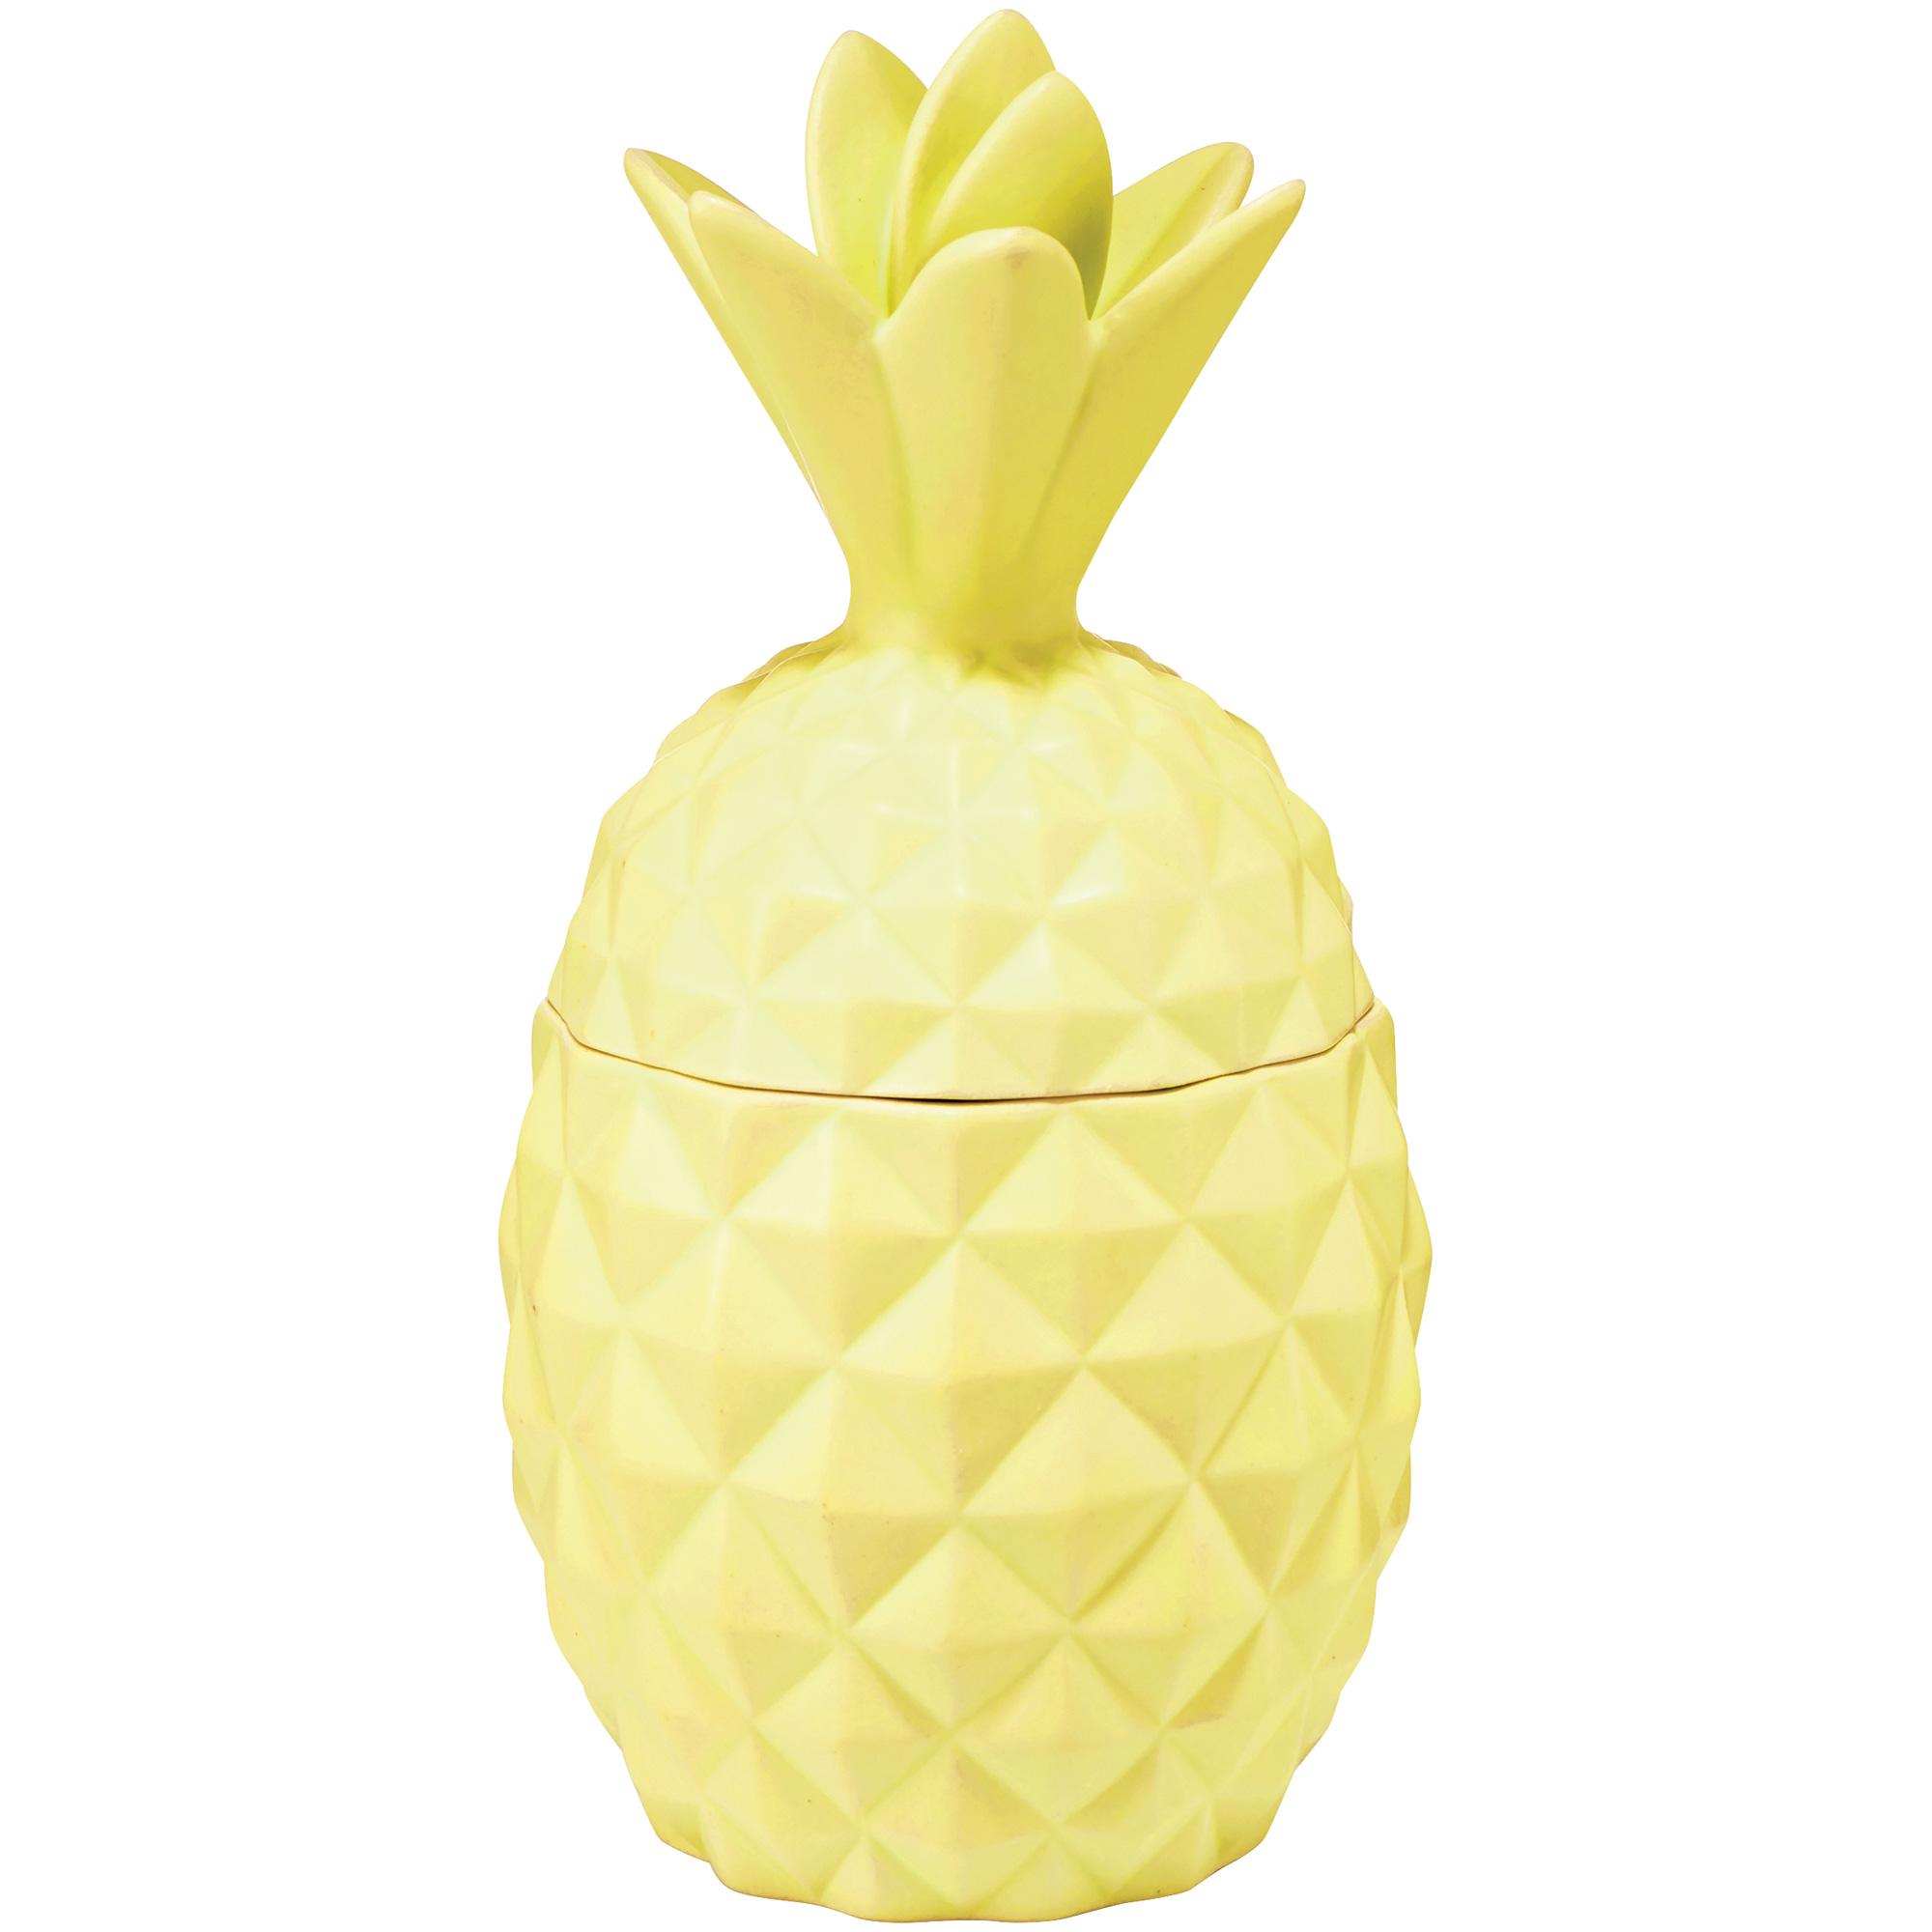 Illume | Pineapple Ceramic Pineapple Cliantro Candle